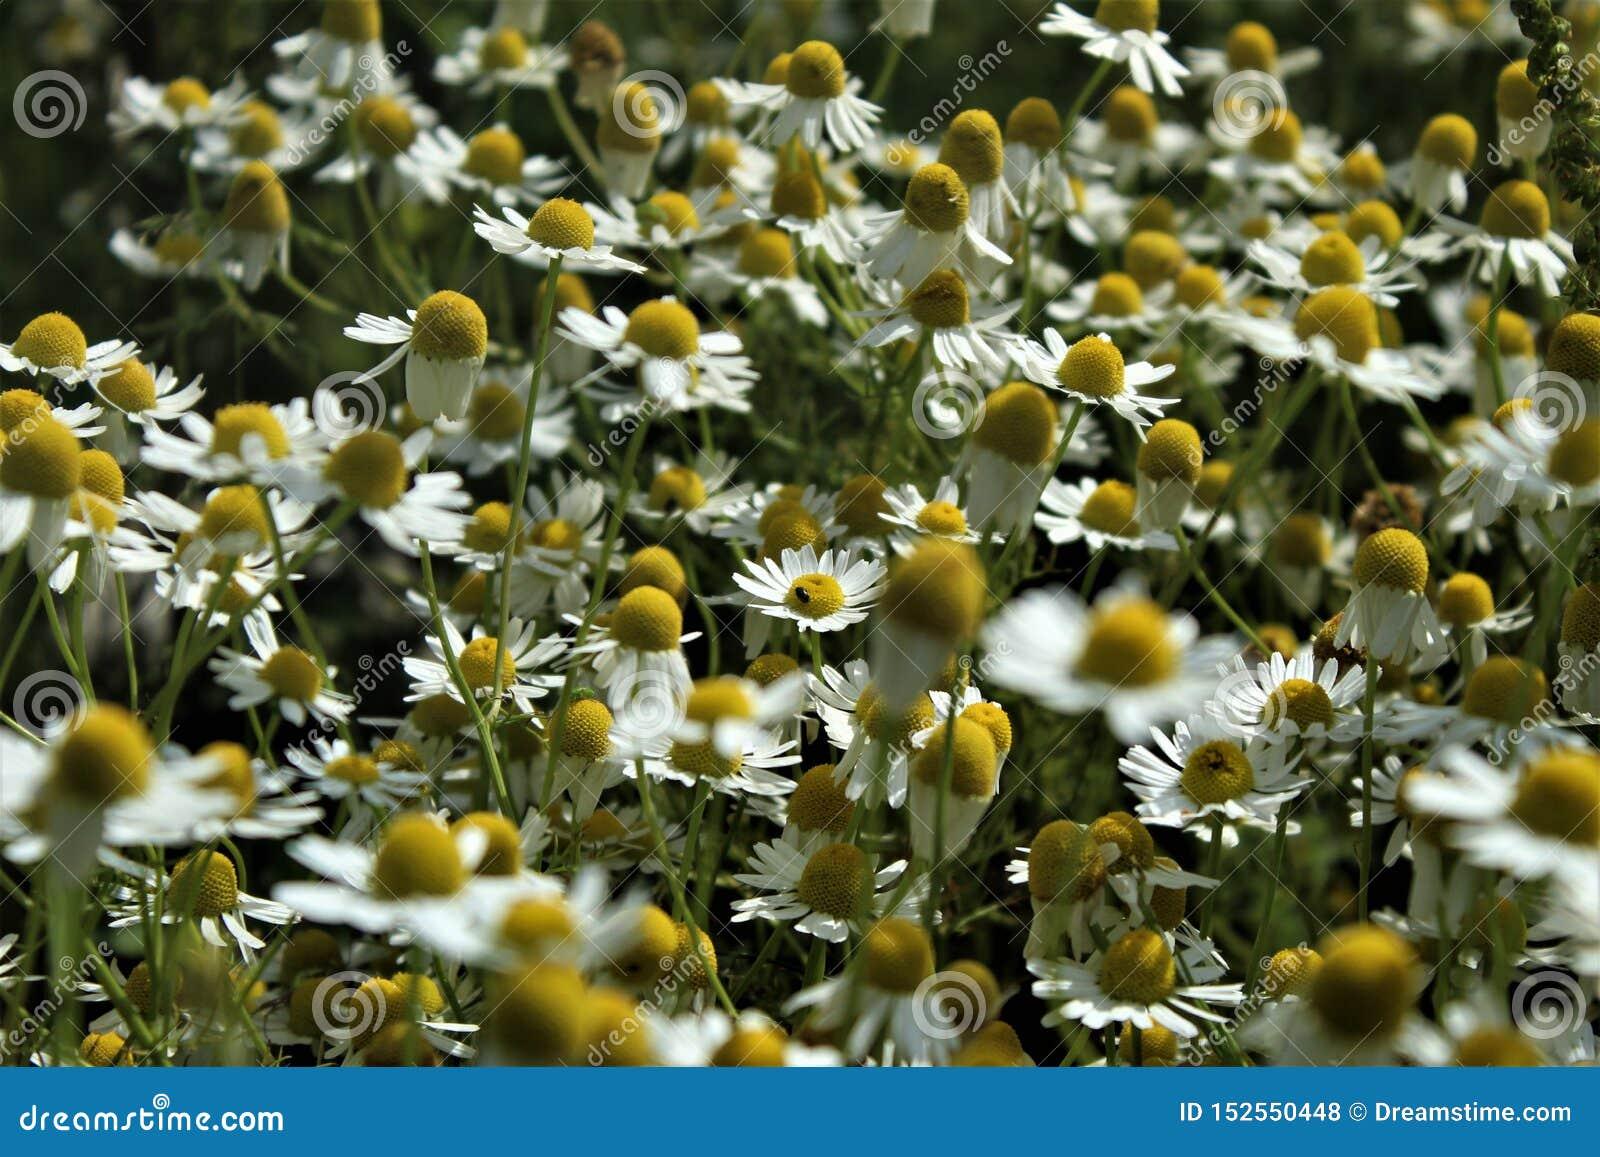 Цветки и травы стоцвета цветут красиво